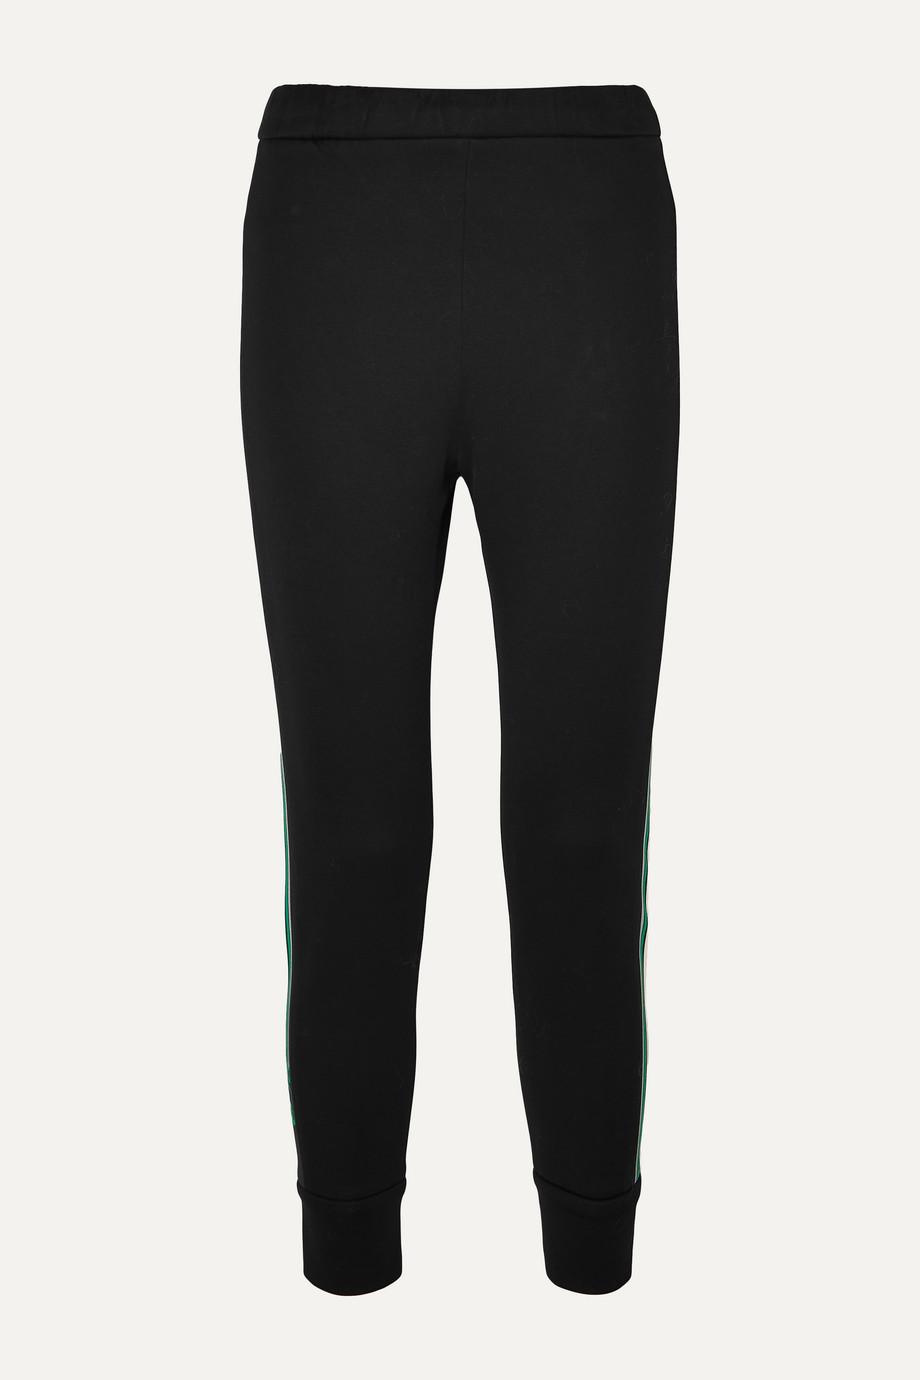 Prada Striped cotton-blend jersey track pants